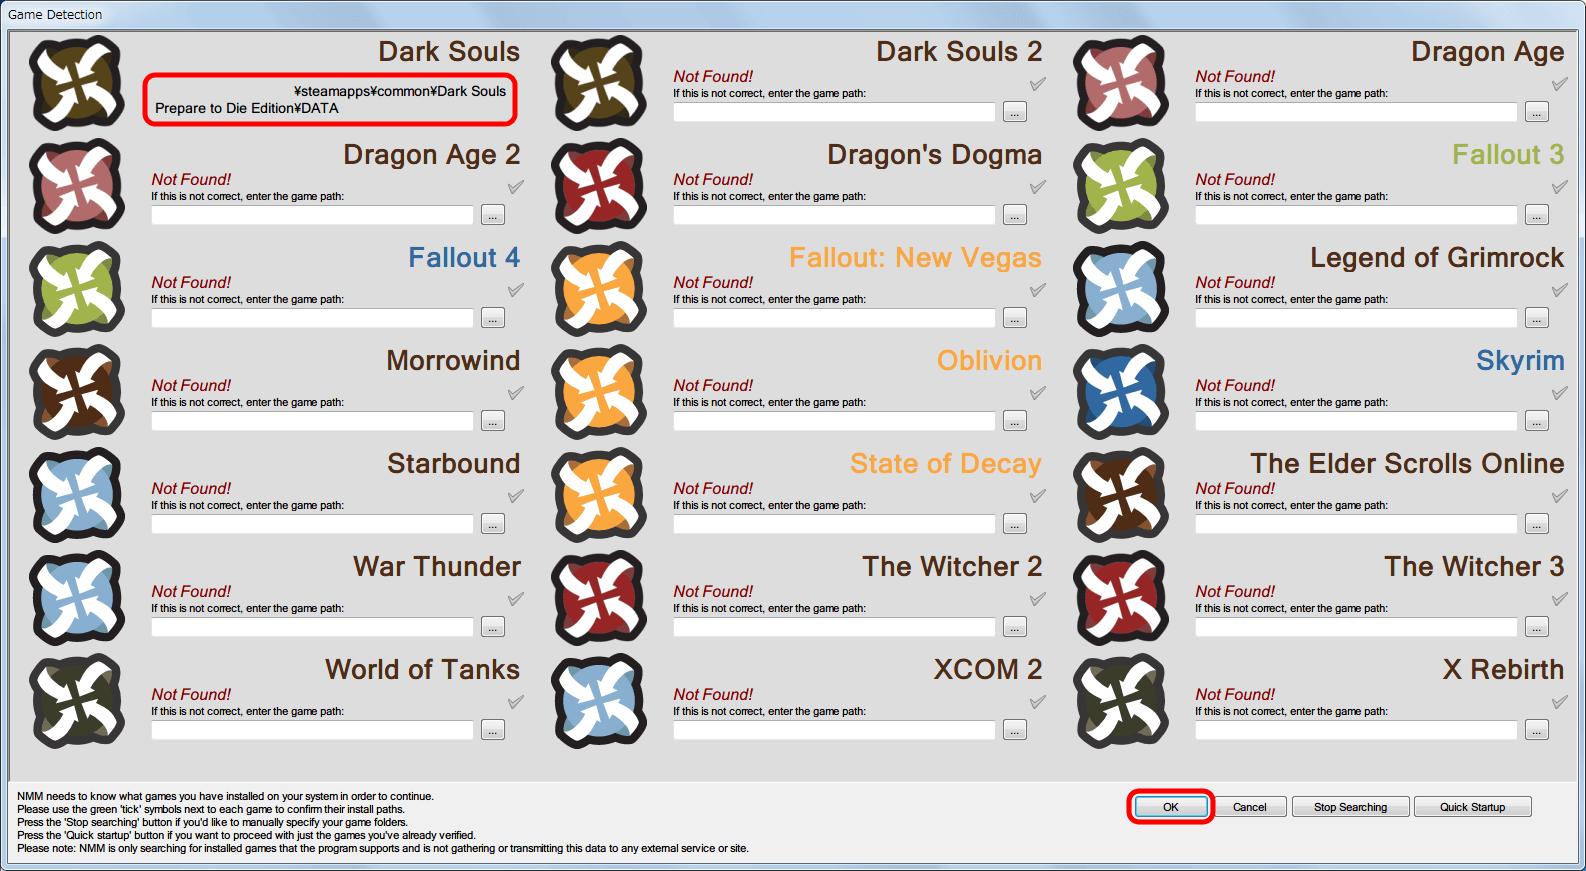 Dark Souls がインストールされているフォルダパス名を入力または選択後に表示される緑のチェックマークをクリックすると、NMM に Dark Souls のインストールパス名を設定。OK ボタンをクリック。パス名は Steam 版のものだが GfWL 版でも可能